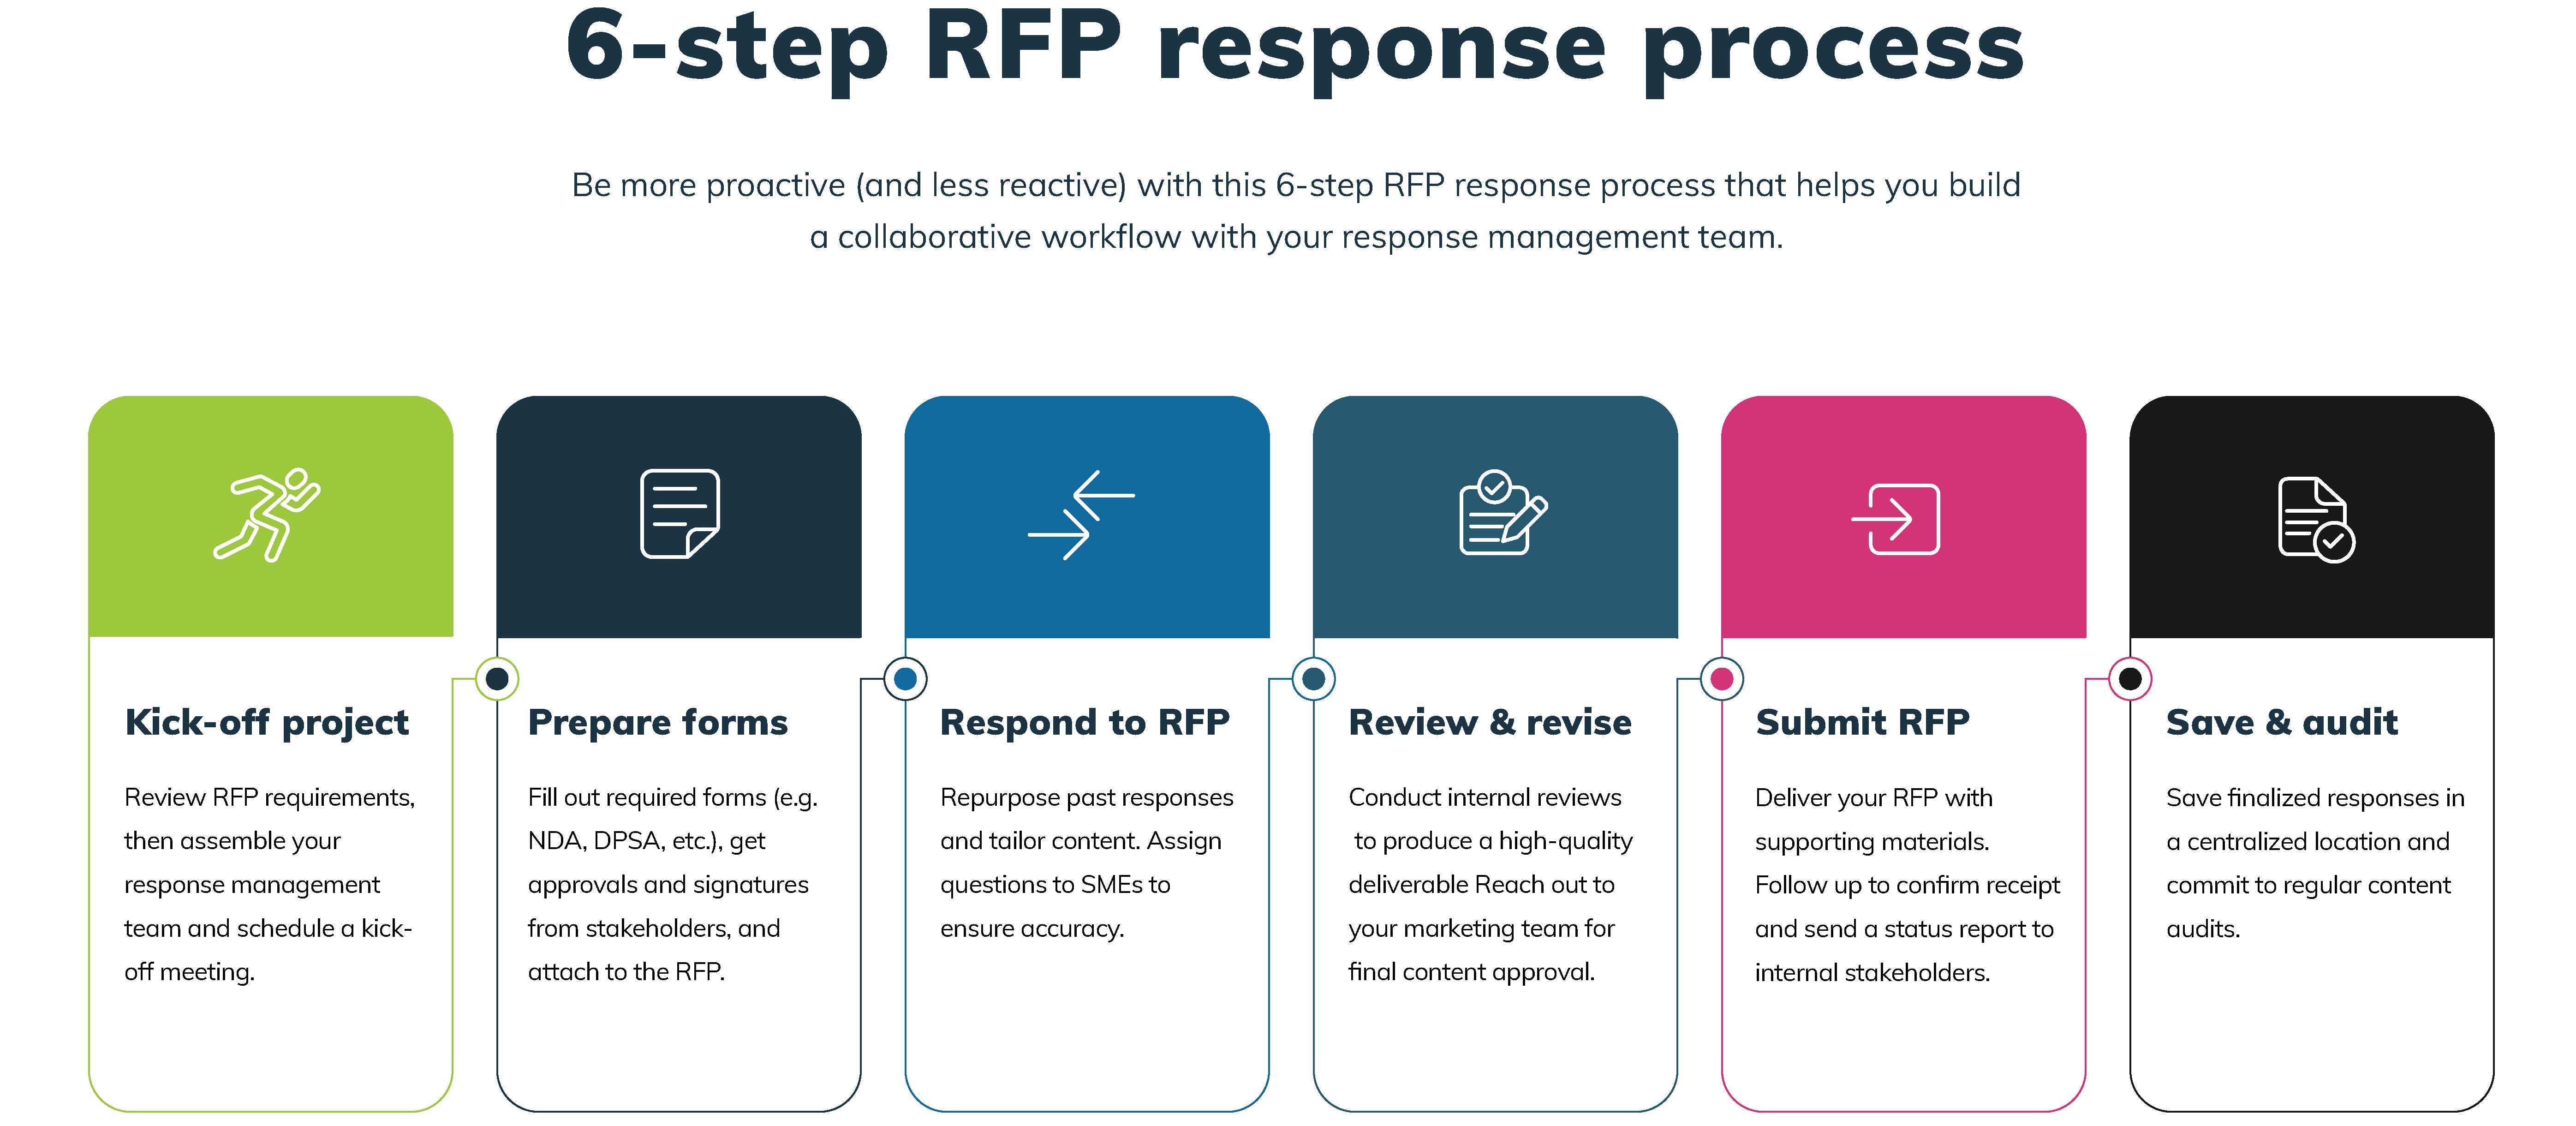 RFP Response Process Steps